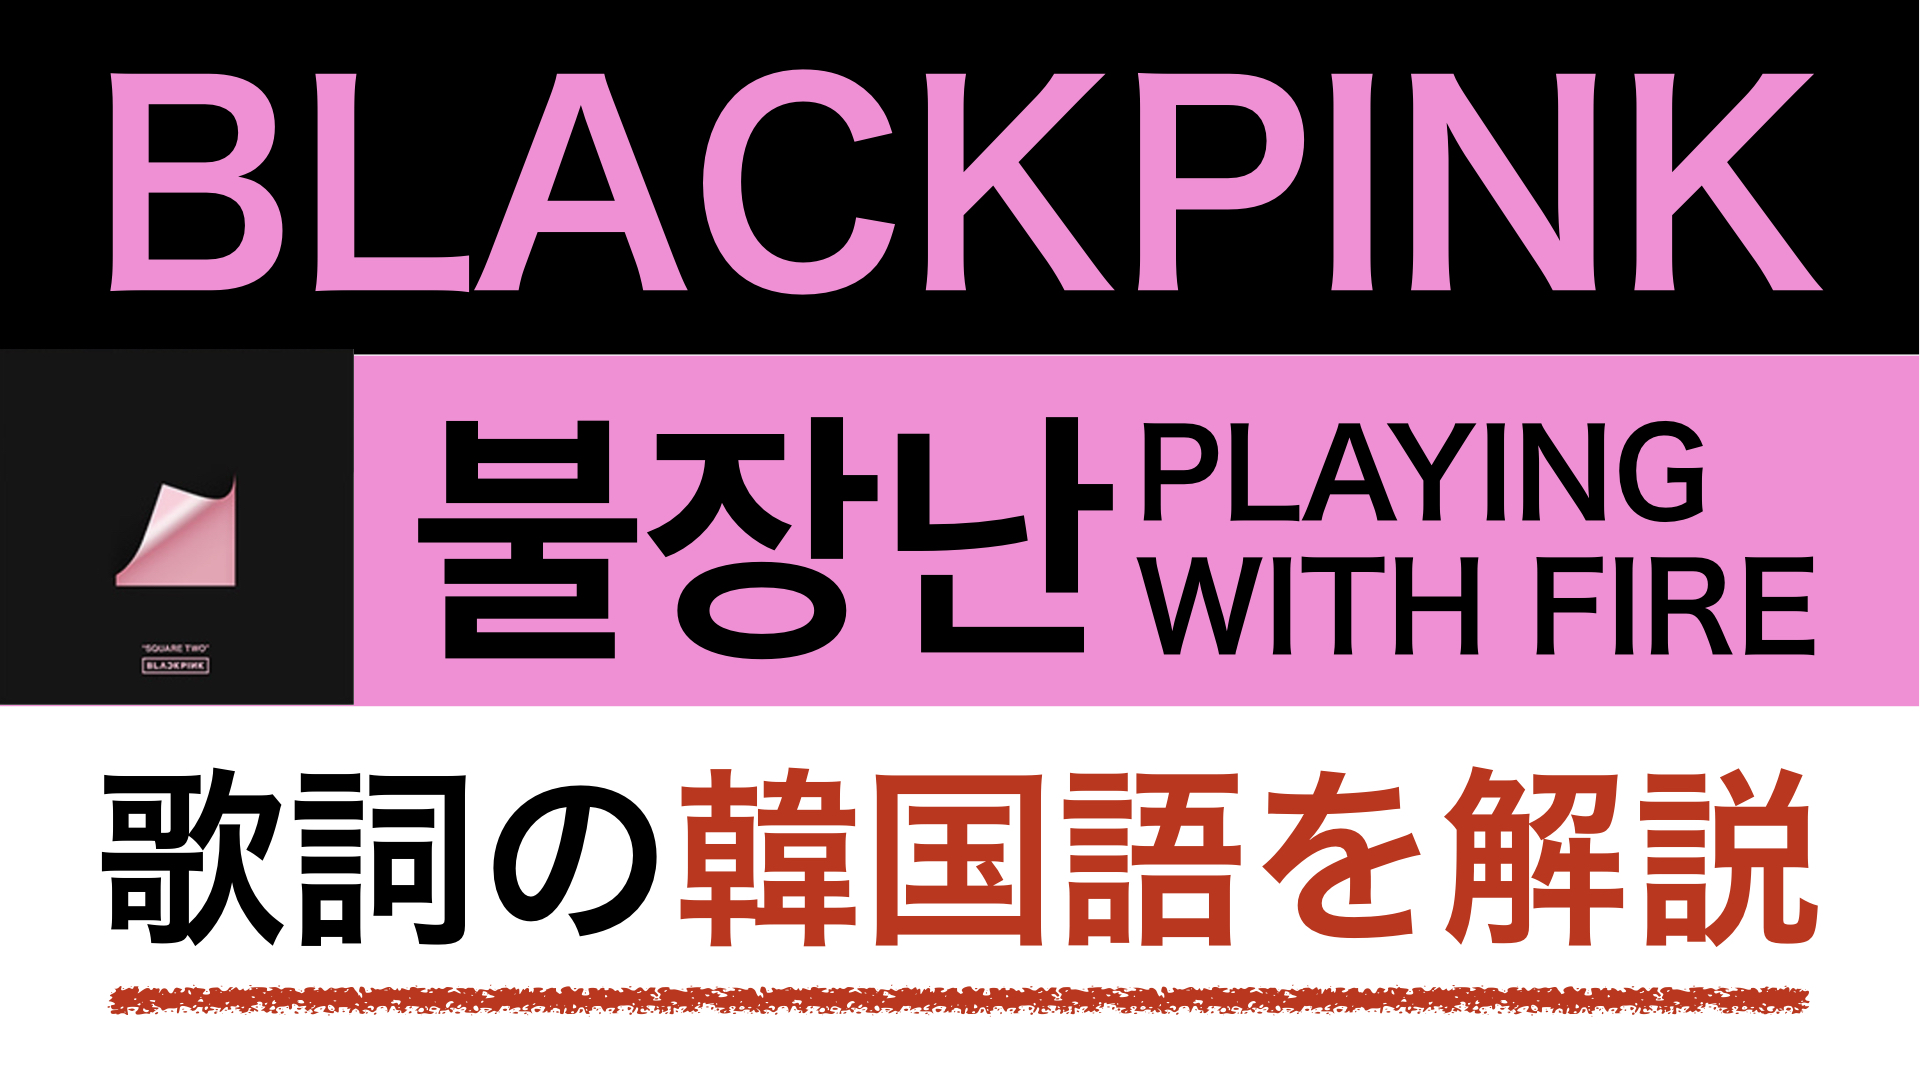 【K-POPで学ぶ韓国語】BLACKPINKの불장난・火遊びの歌詞を解説しました。